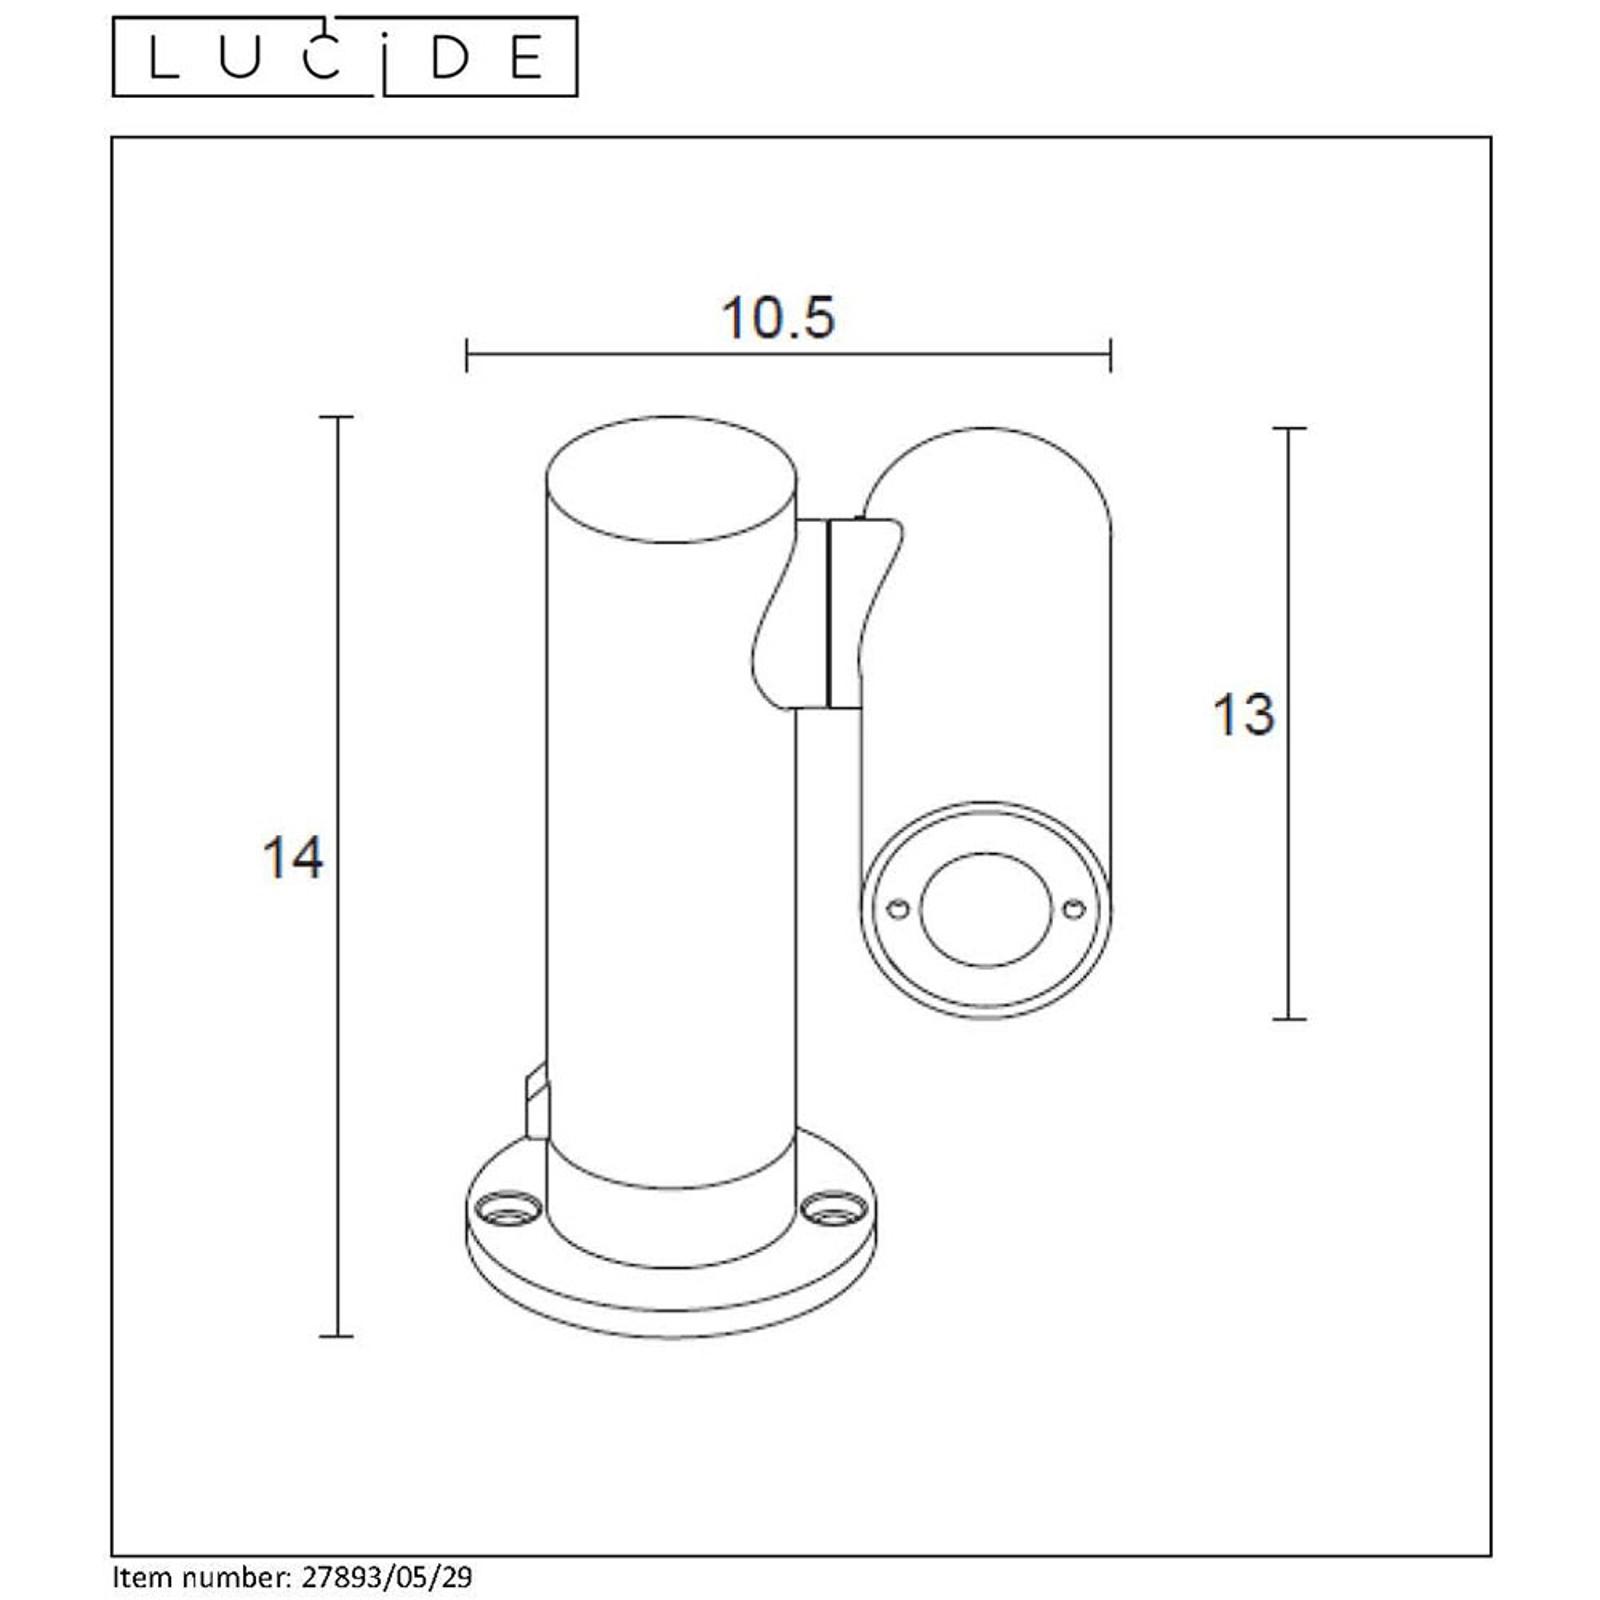 LED-Sockelleuchte Tatum mit drehbarem Spot, 14 cm